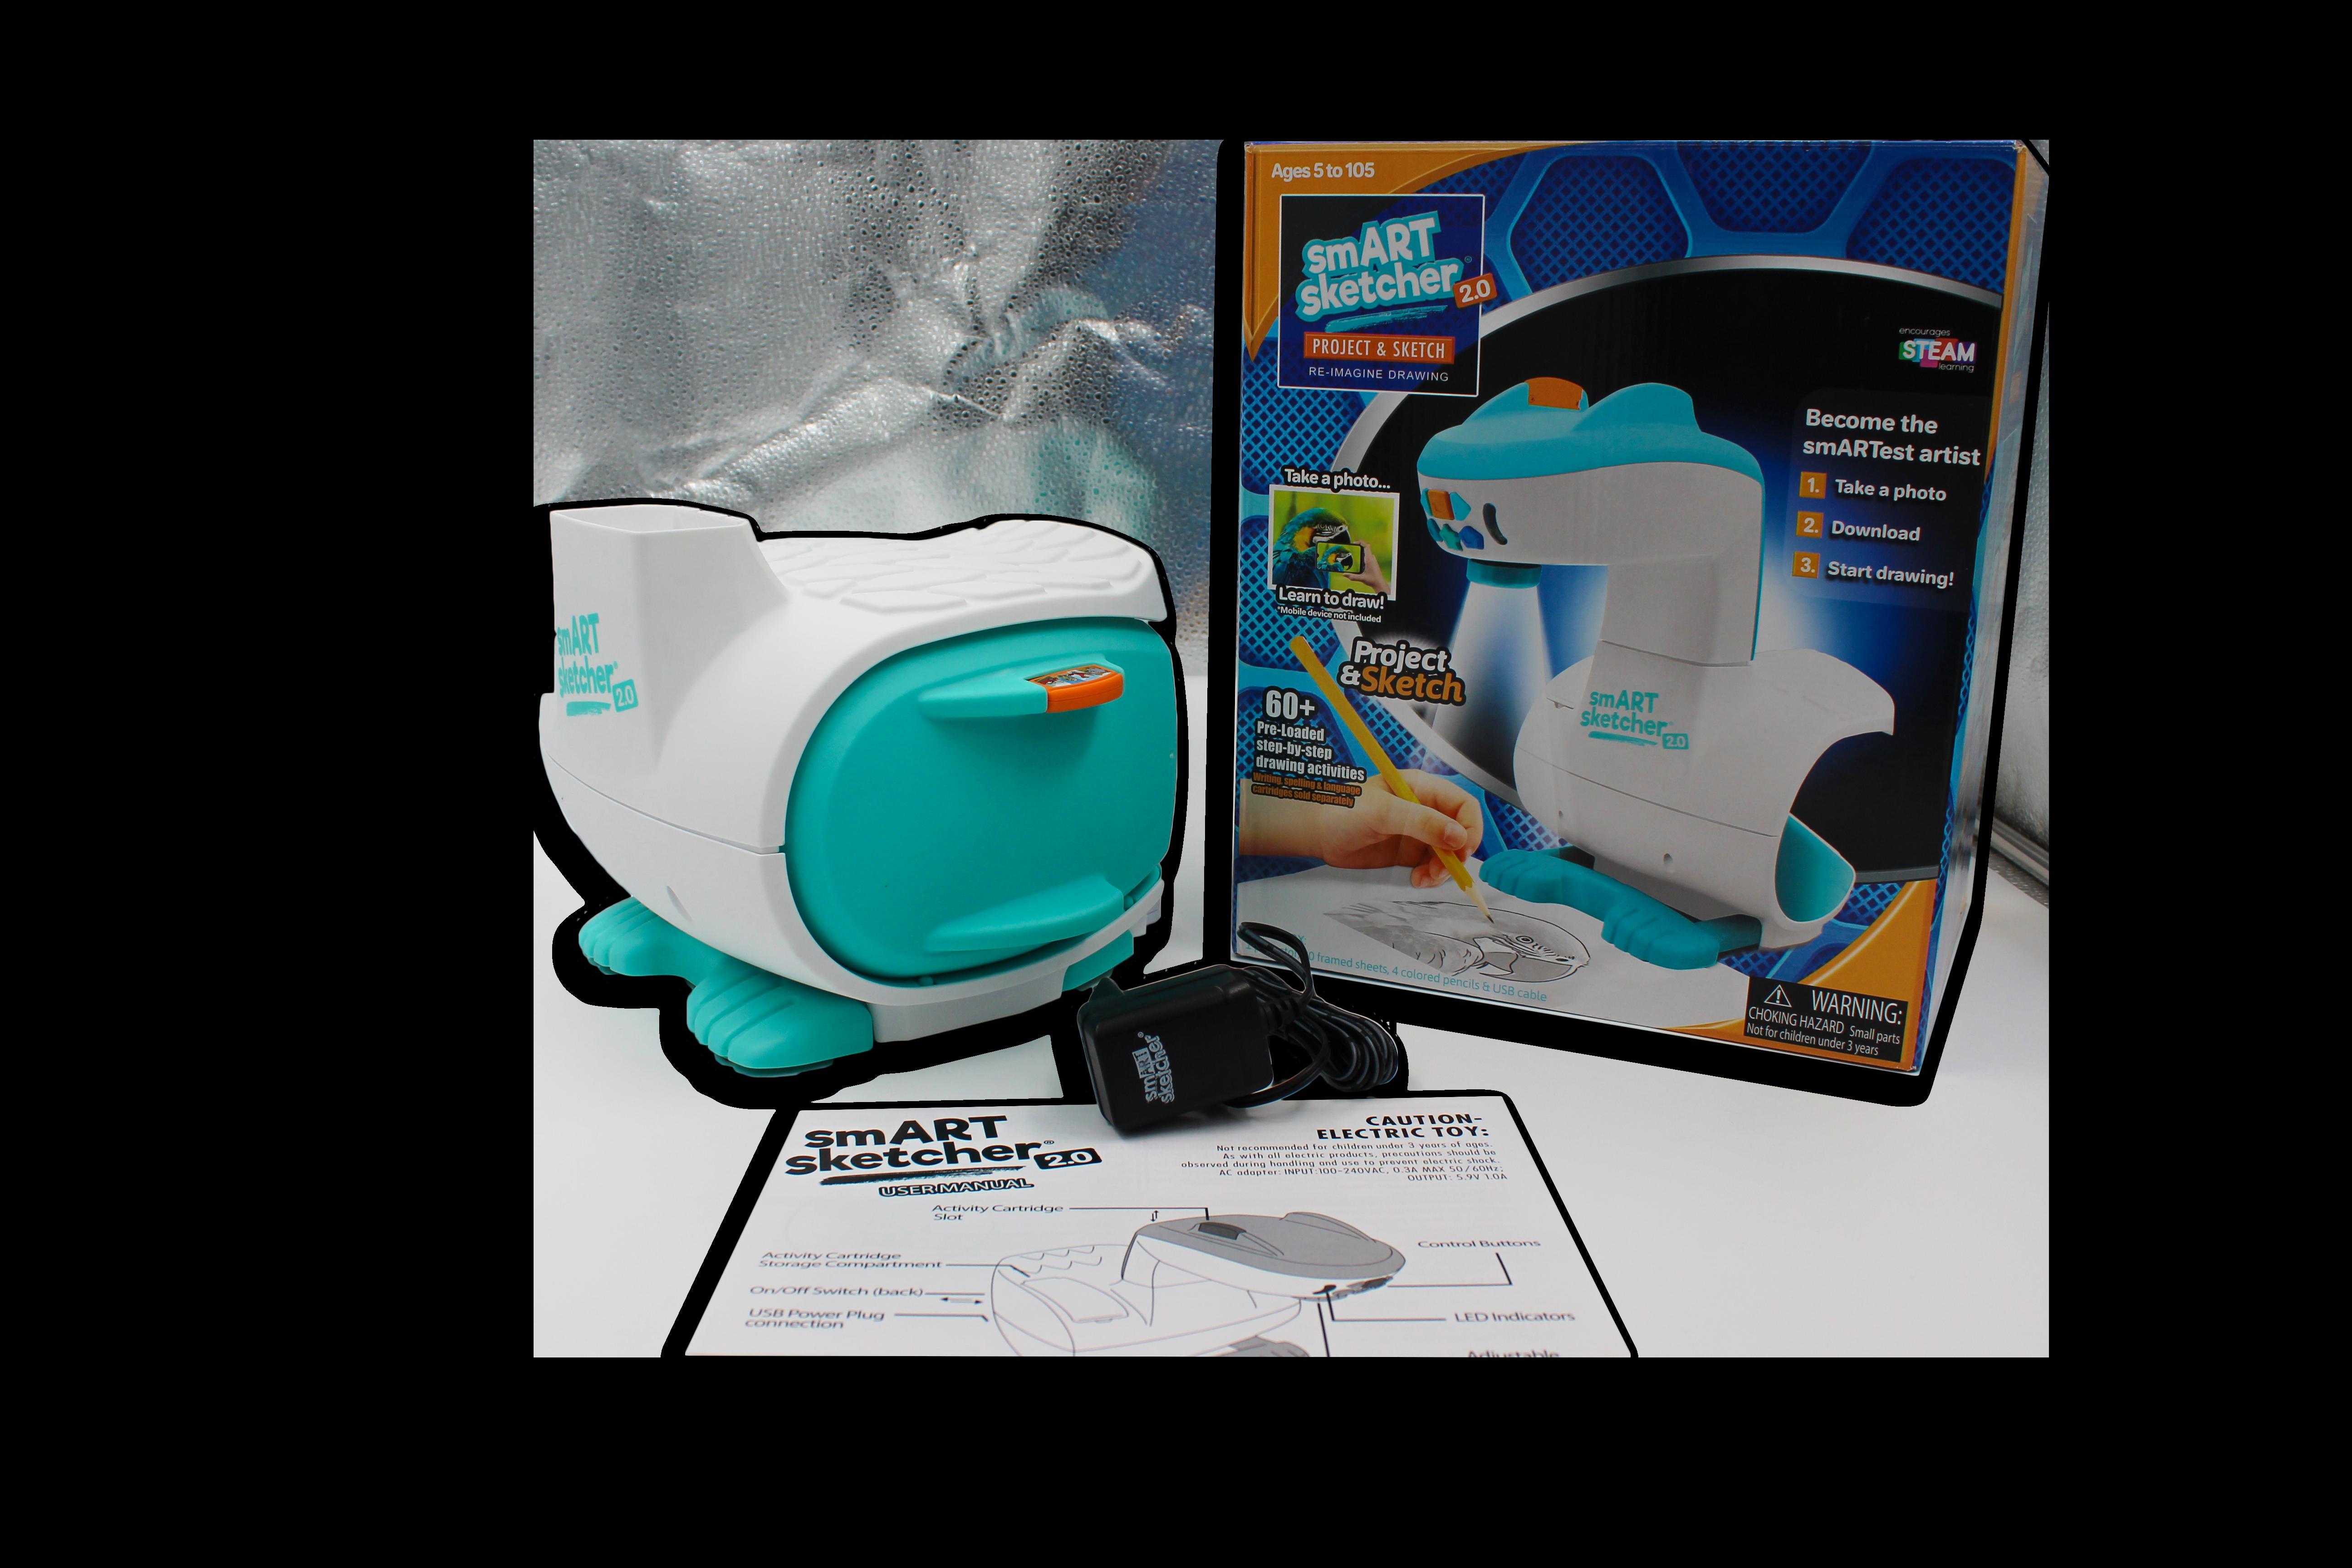 Projektor Smart Sketcher PRO